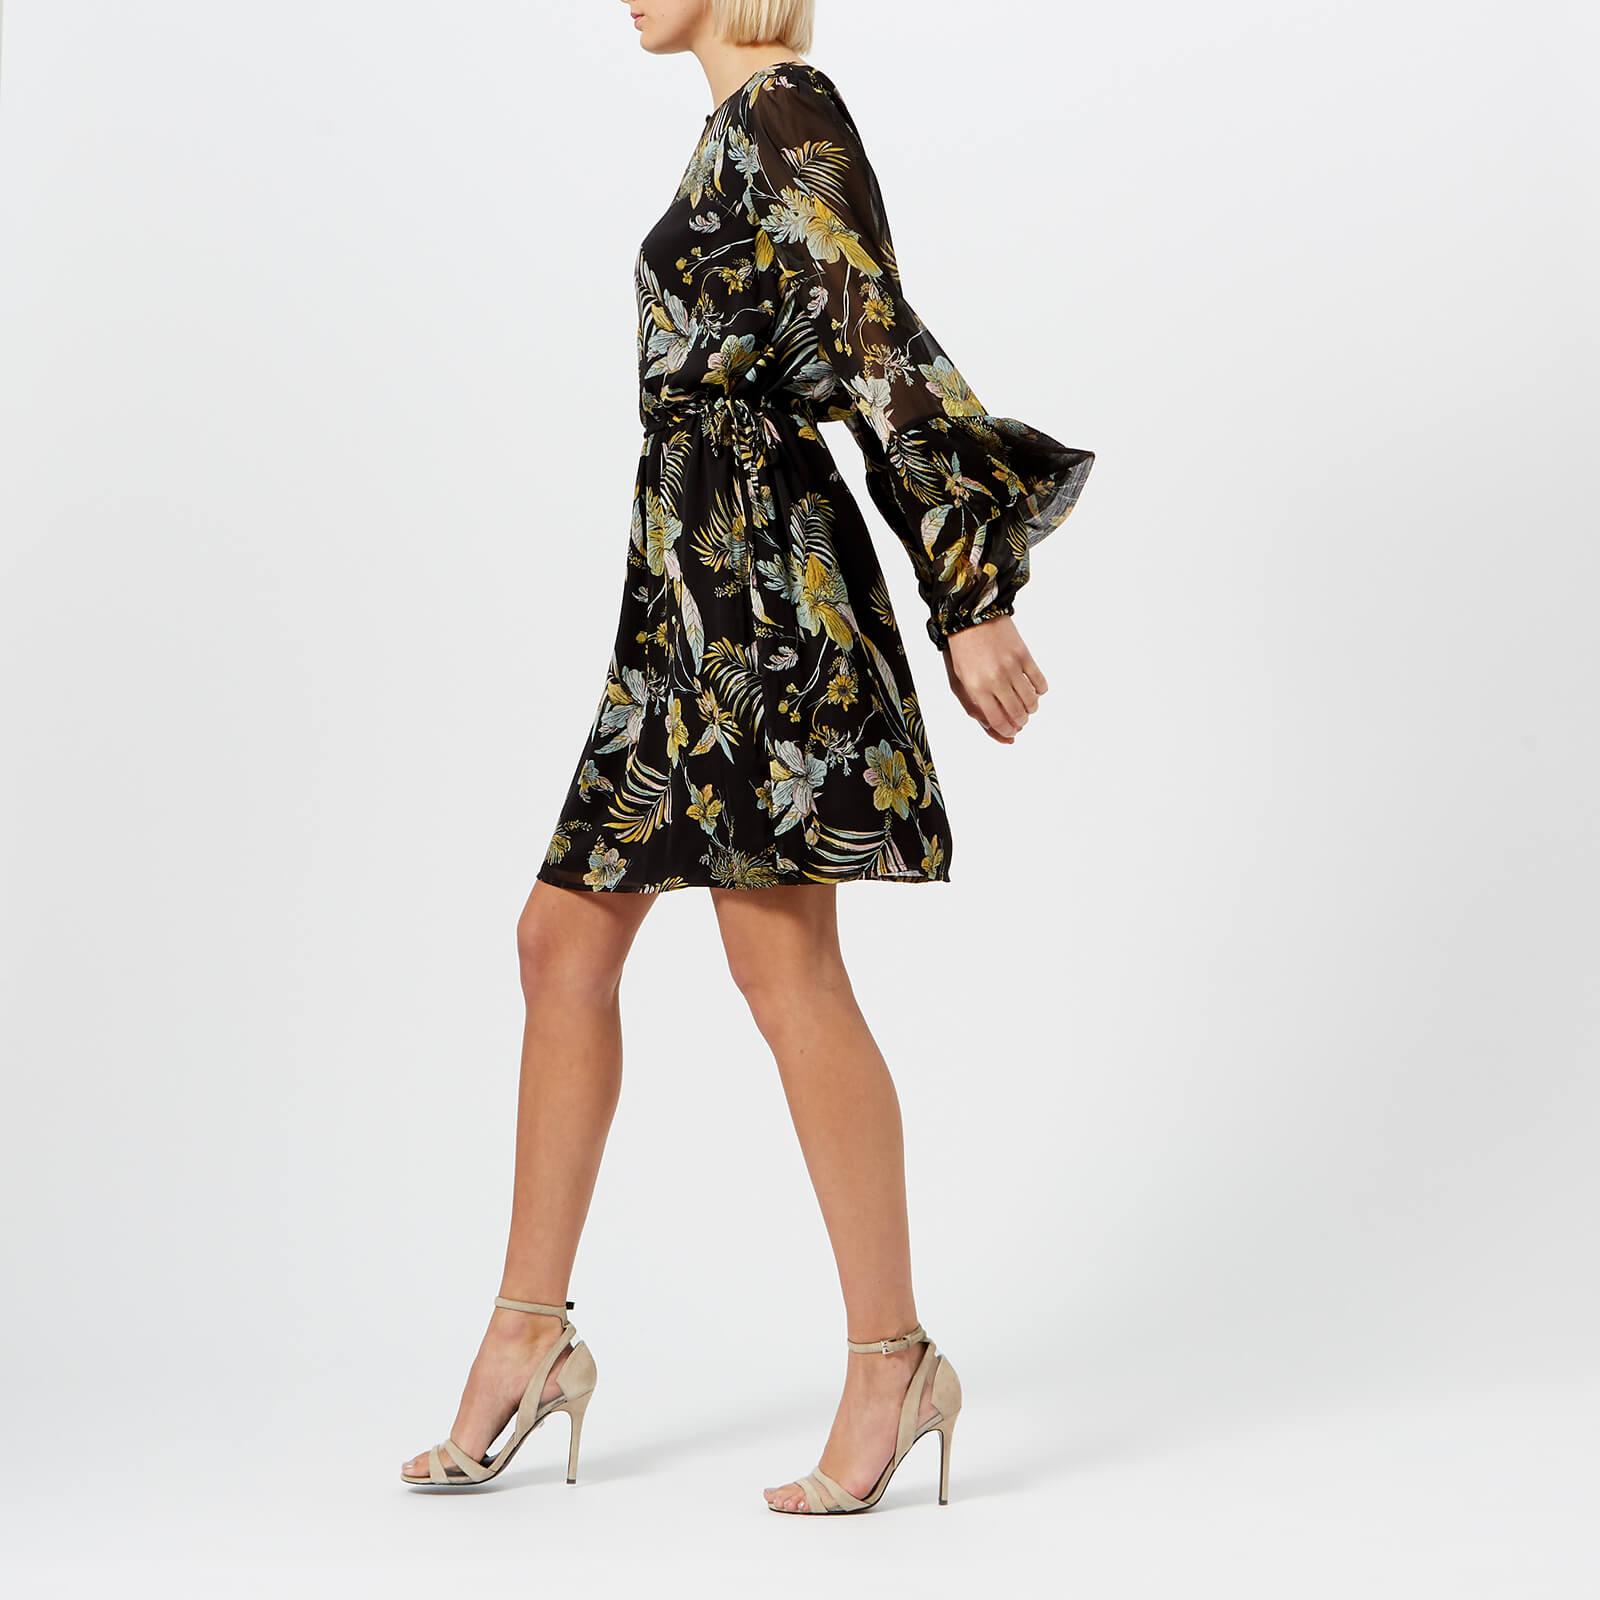 08023823 Gestuz Women's Maui Dress - Black Palm - Free UK Delivery over £50